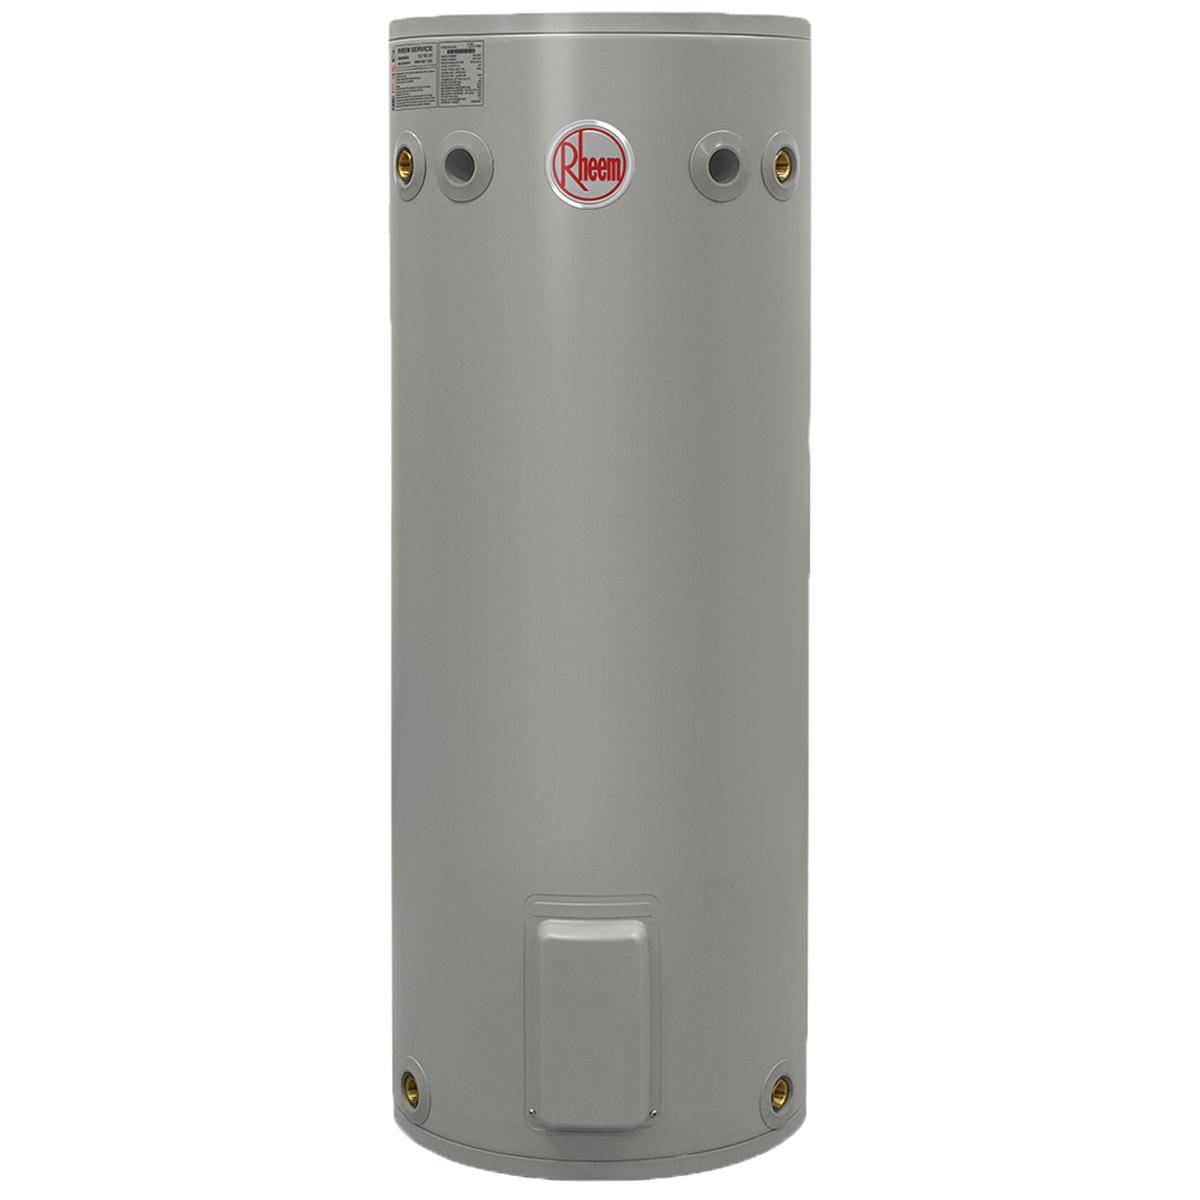 Rheem-Electric-125L-491125-1200px